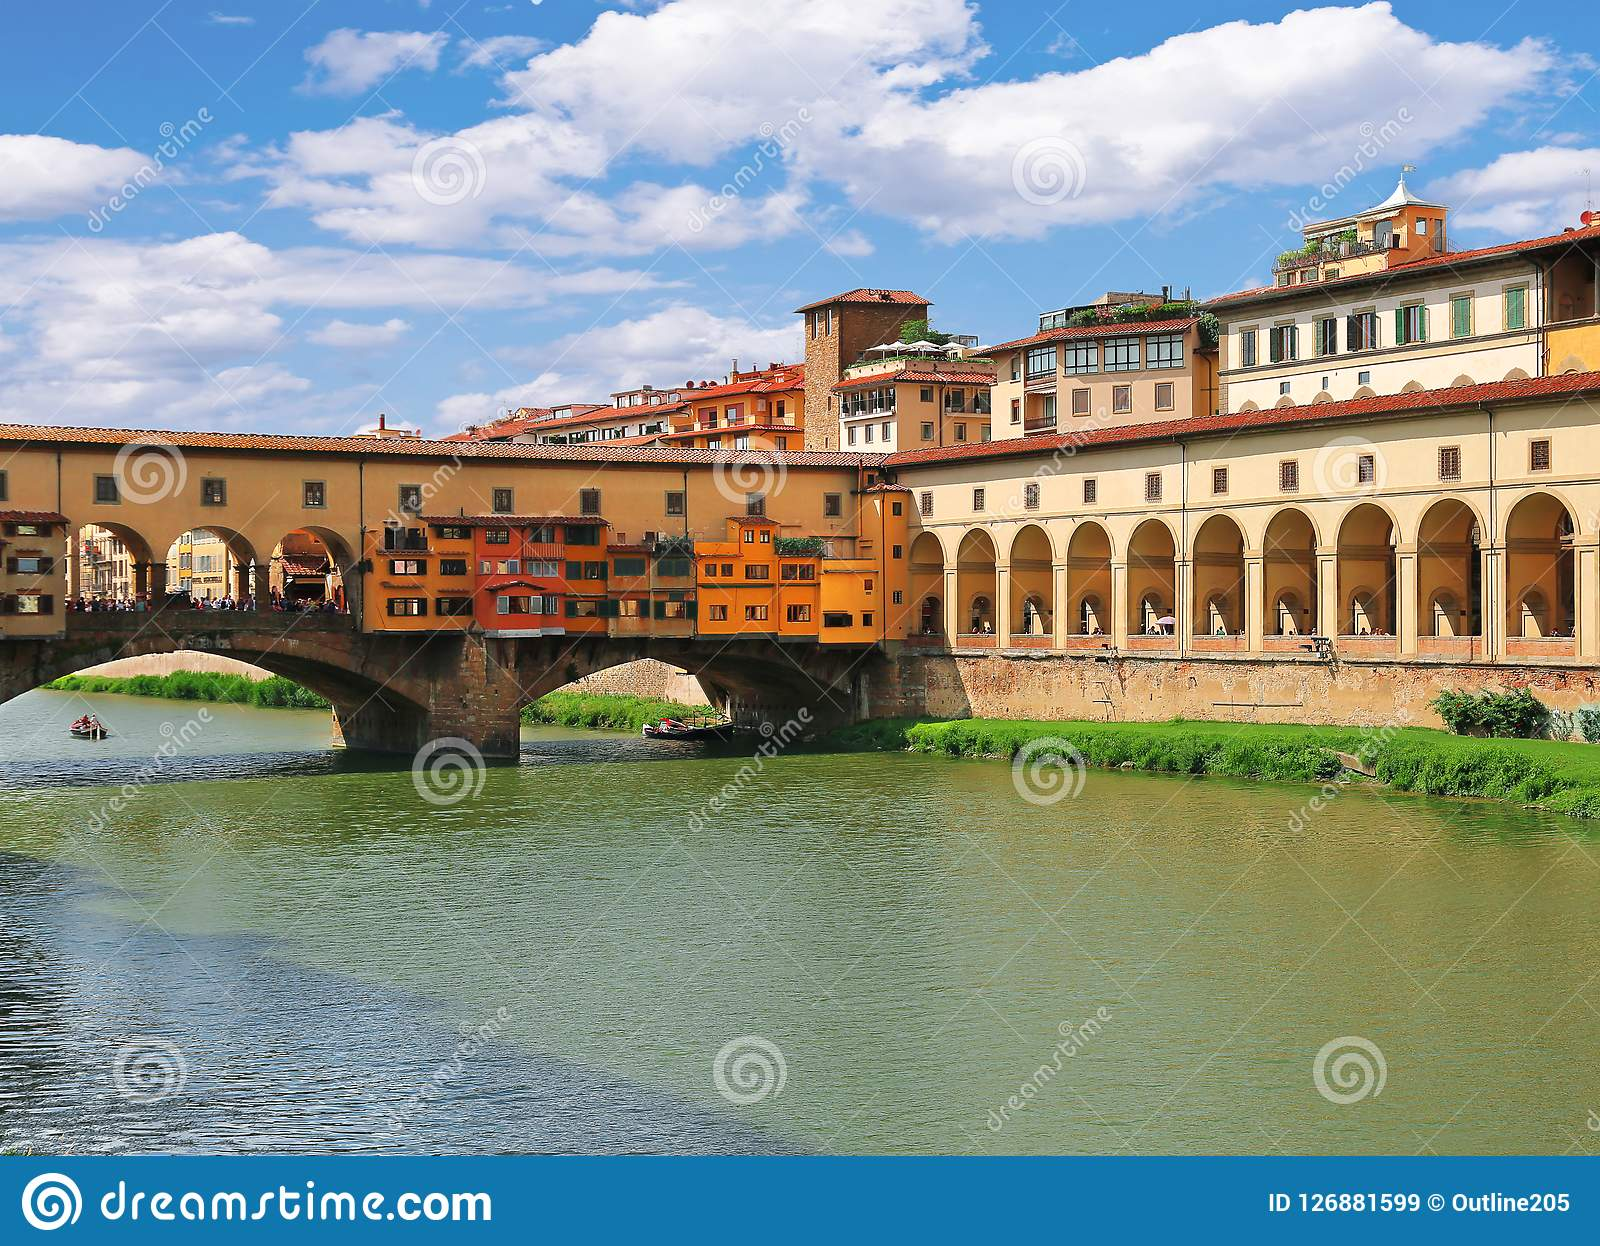 Brücke Ponte Vecchio und Korridor Corridoio Vasariano Vasari in Florenz, Italien